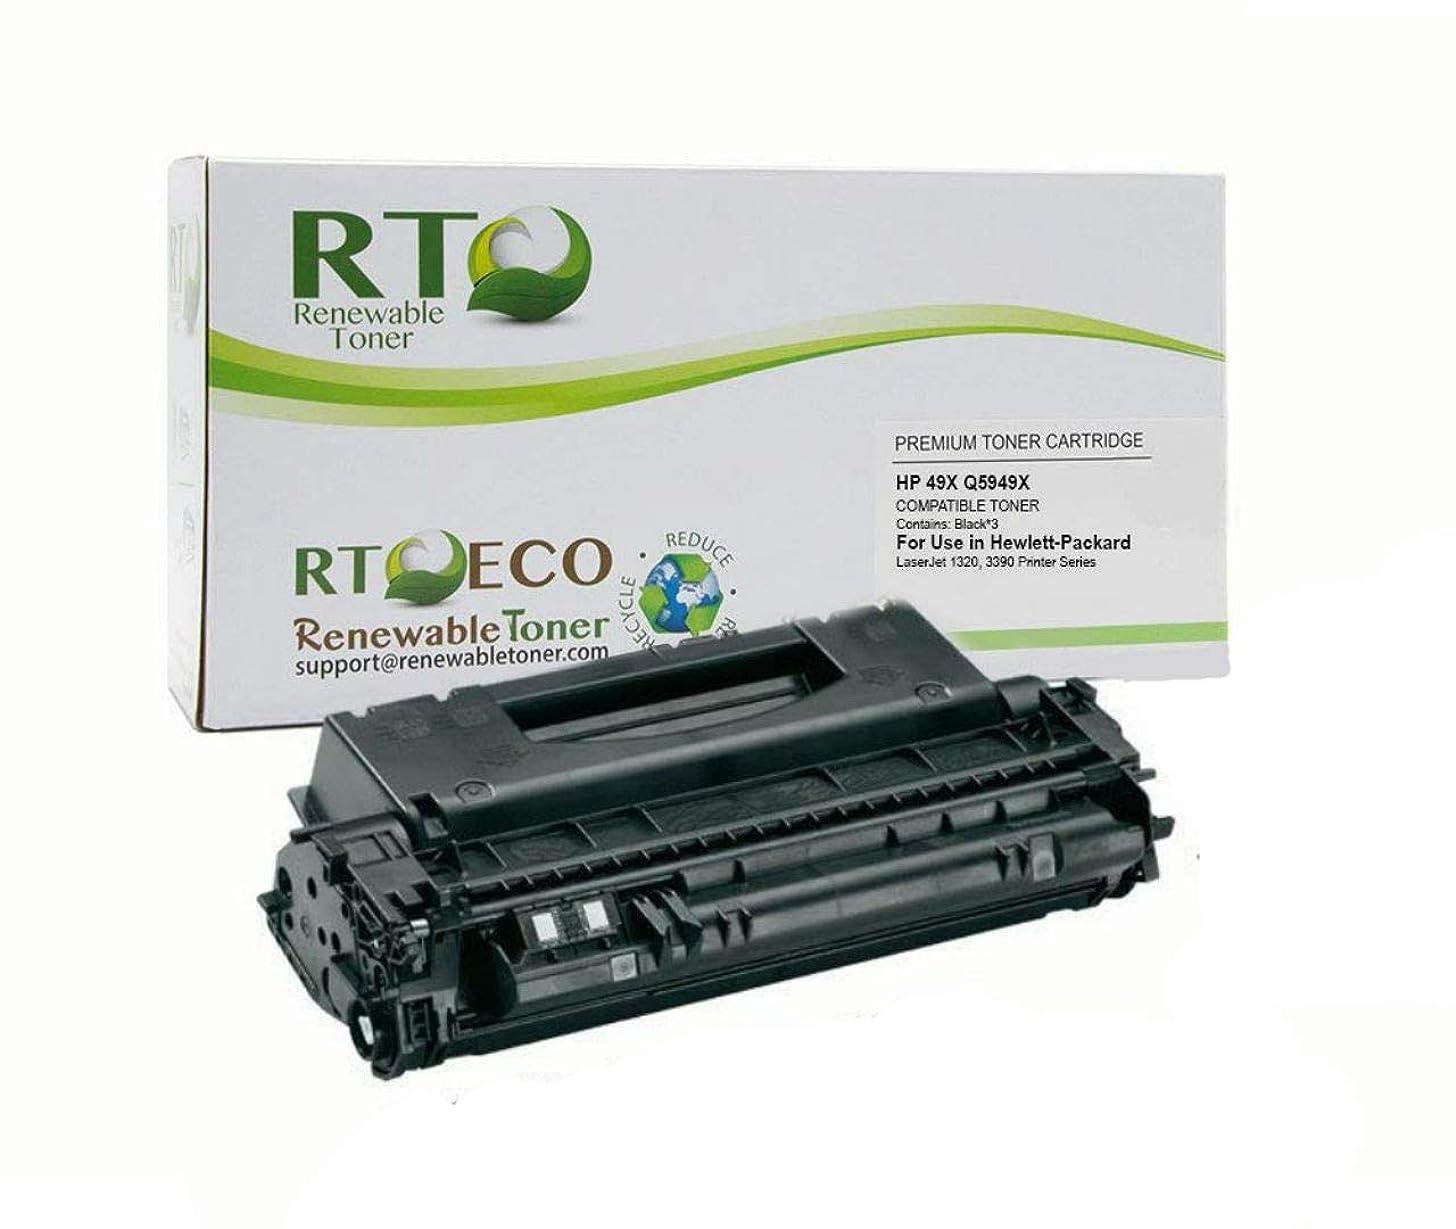 Renewable Toner Compatible High Yield Toner Cartridge Replacement for HP 49X Q5949X Laserjet 1320 3390 3392